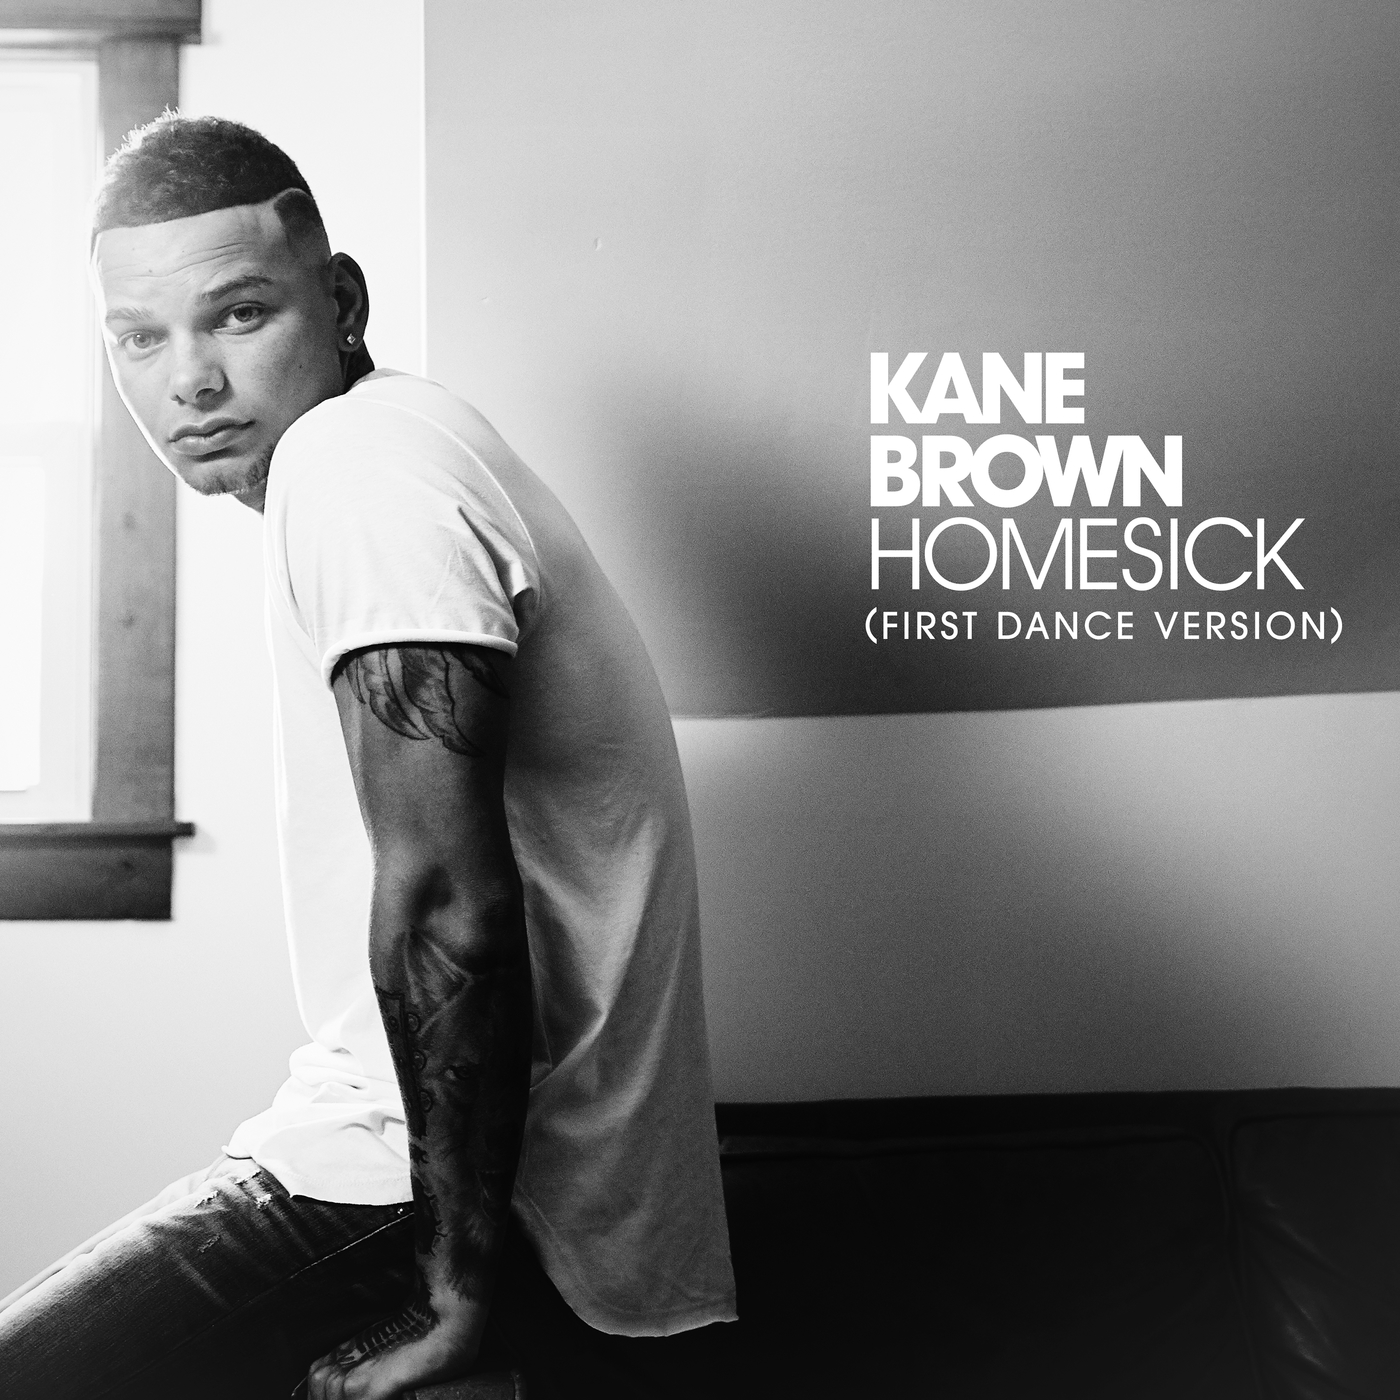 Homesick (First Dance Version) - Kane Brown